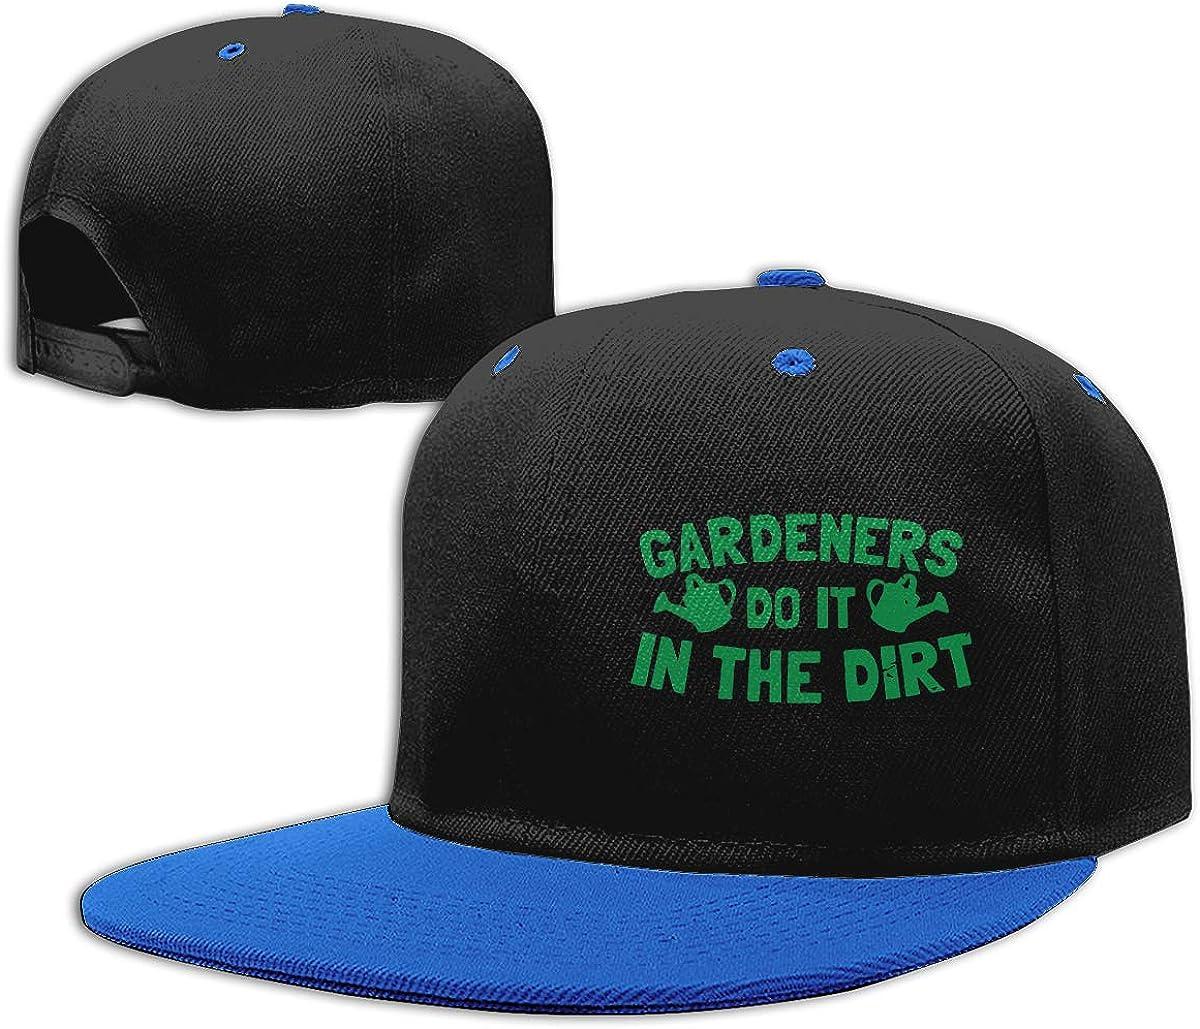 Do It in The Dirt Adults Flat Bill Baseball Caps Women Men Punk Rock Cap